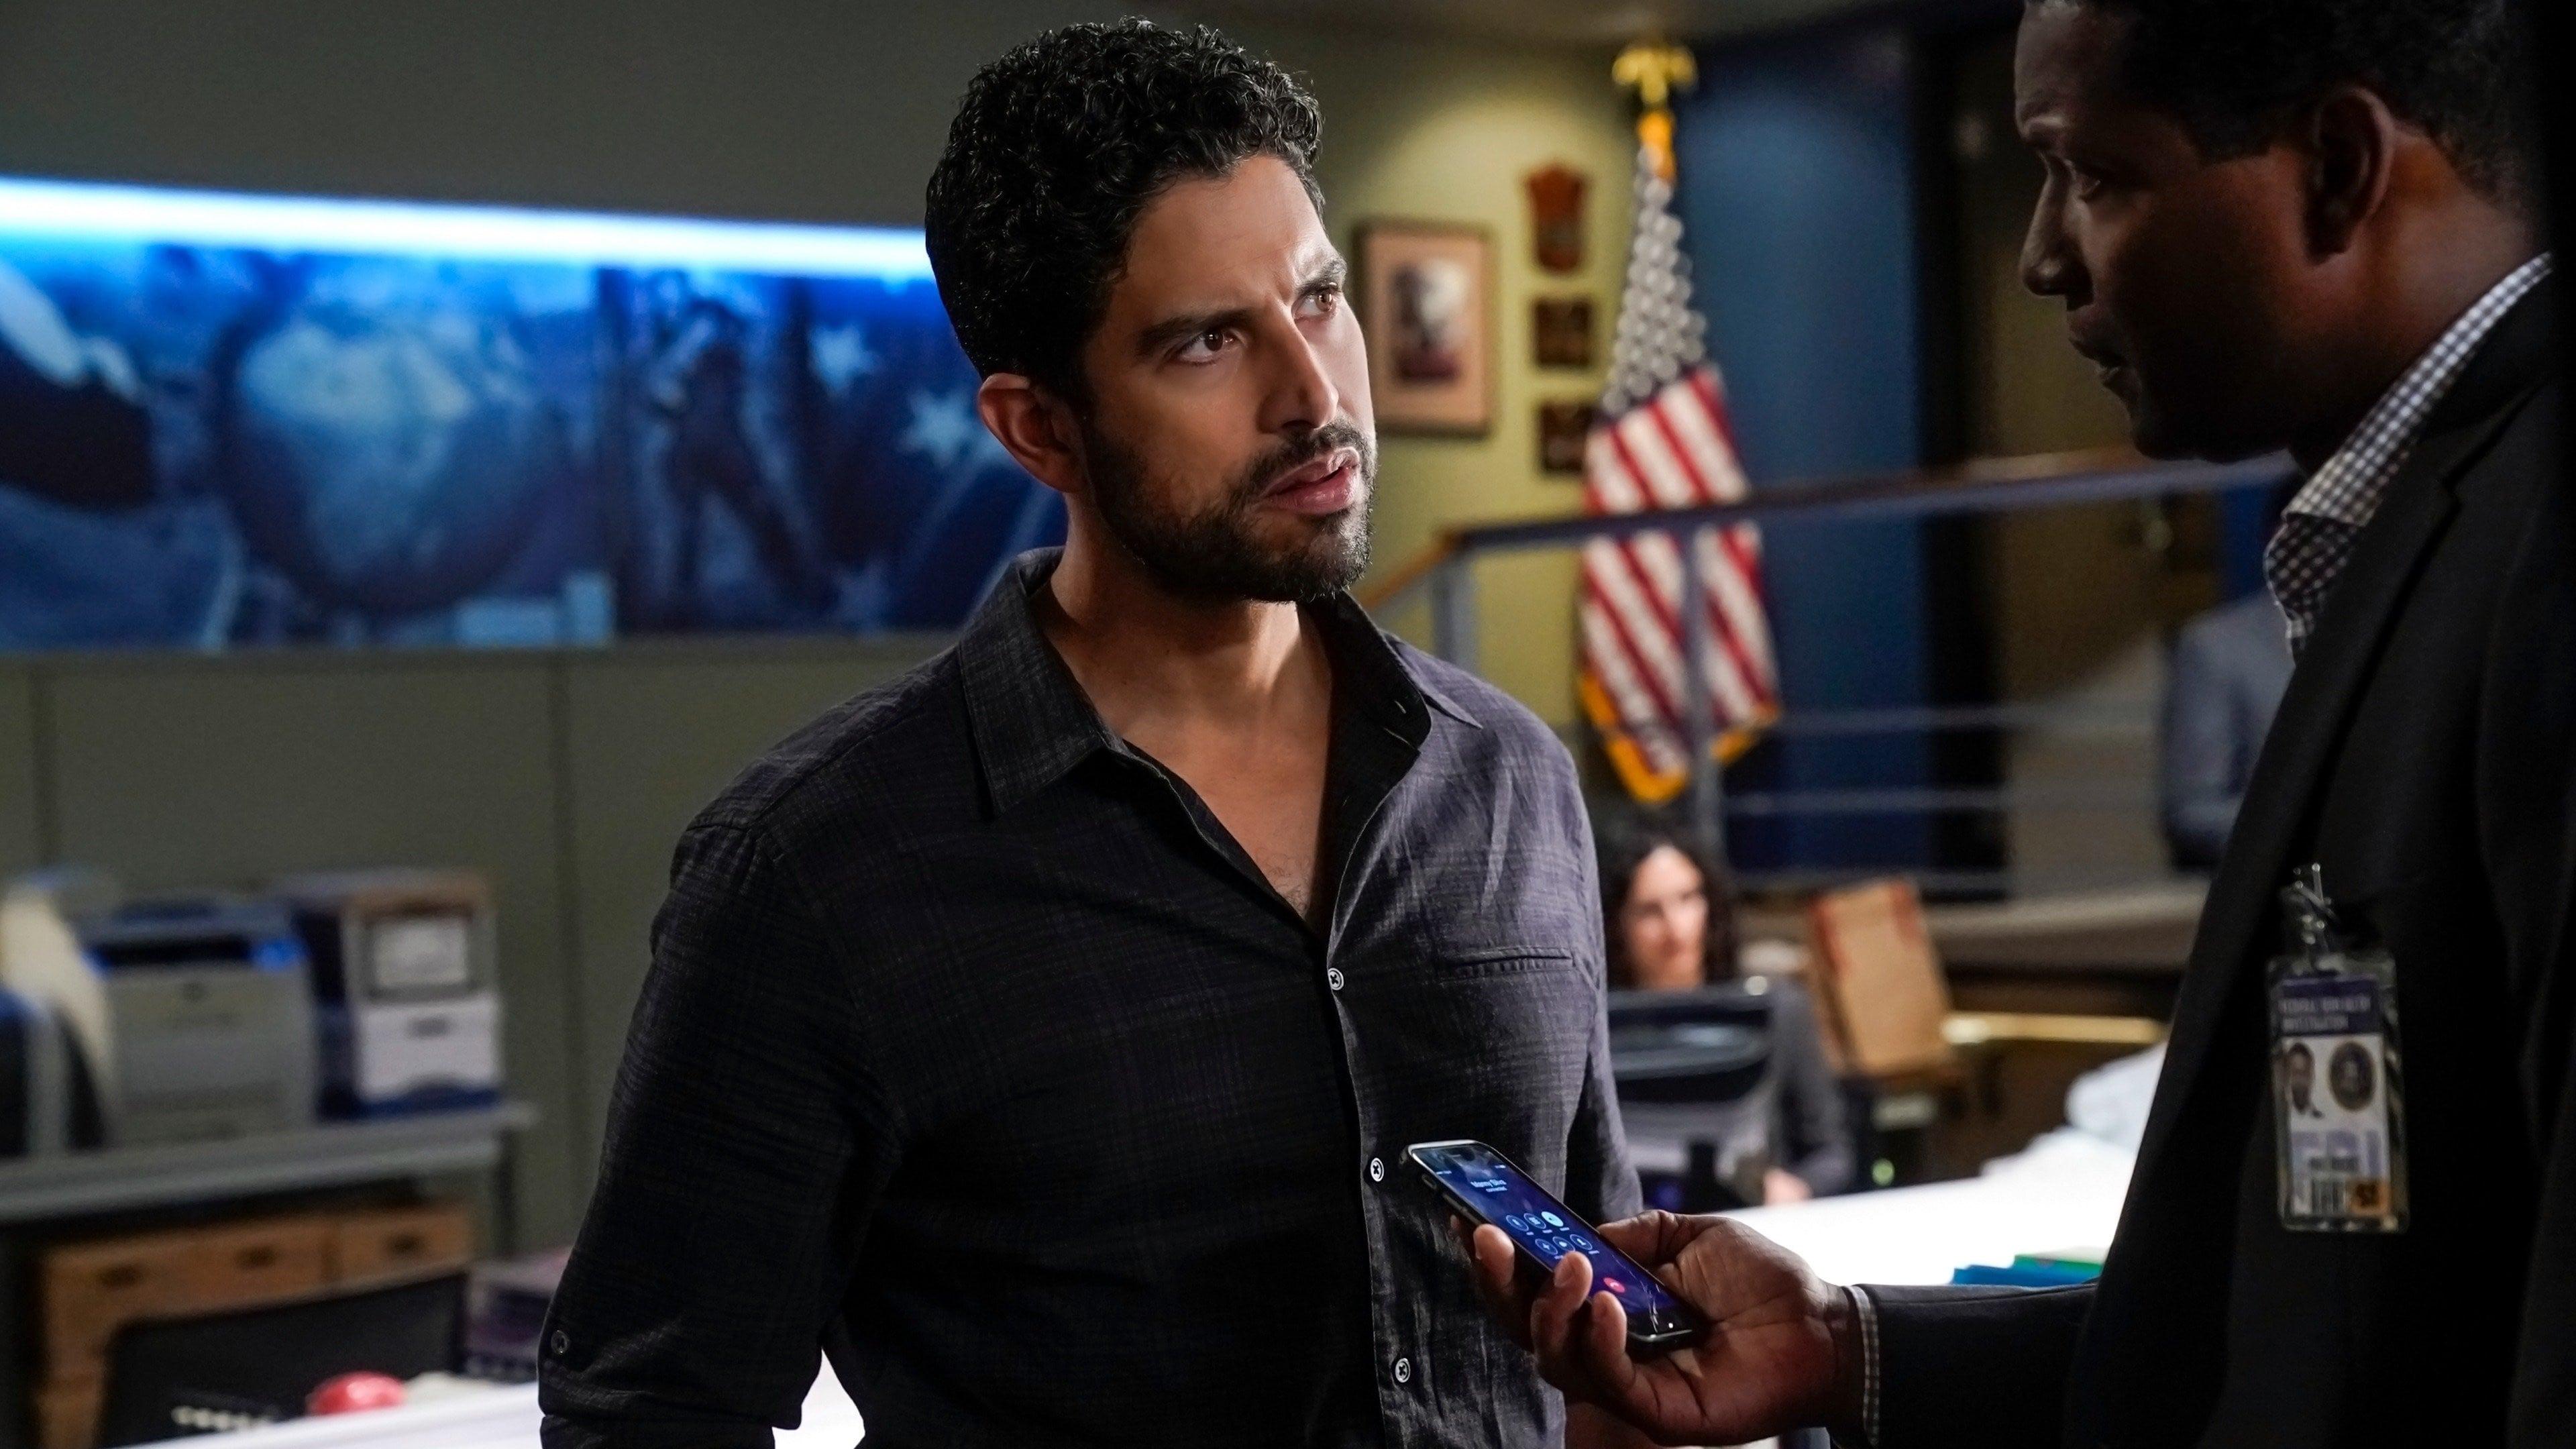 Criminal Minds - Season 14 Episode 6 : Luke